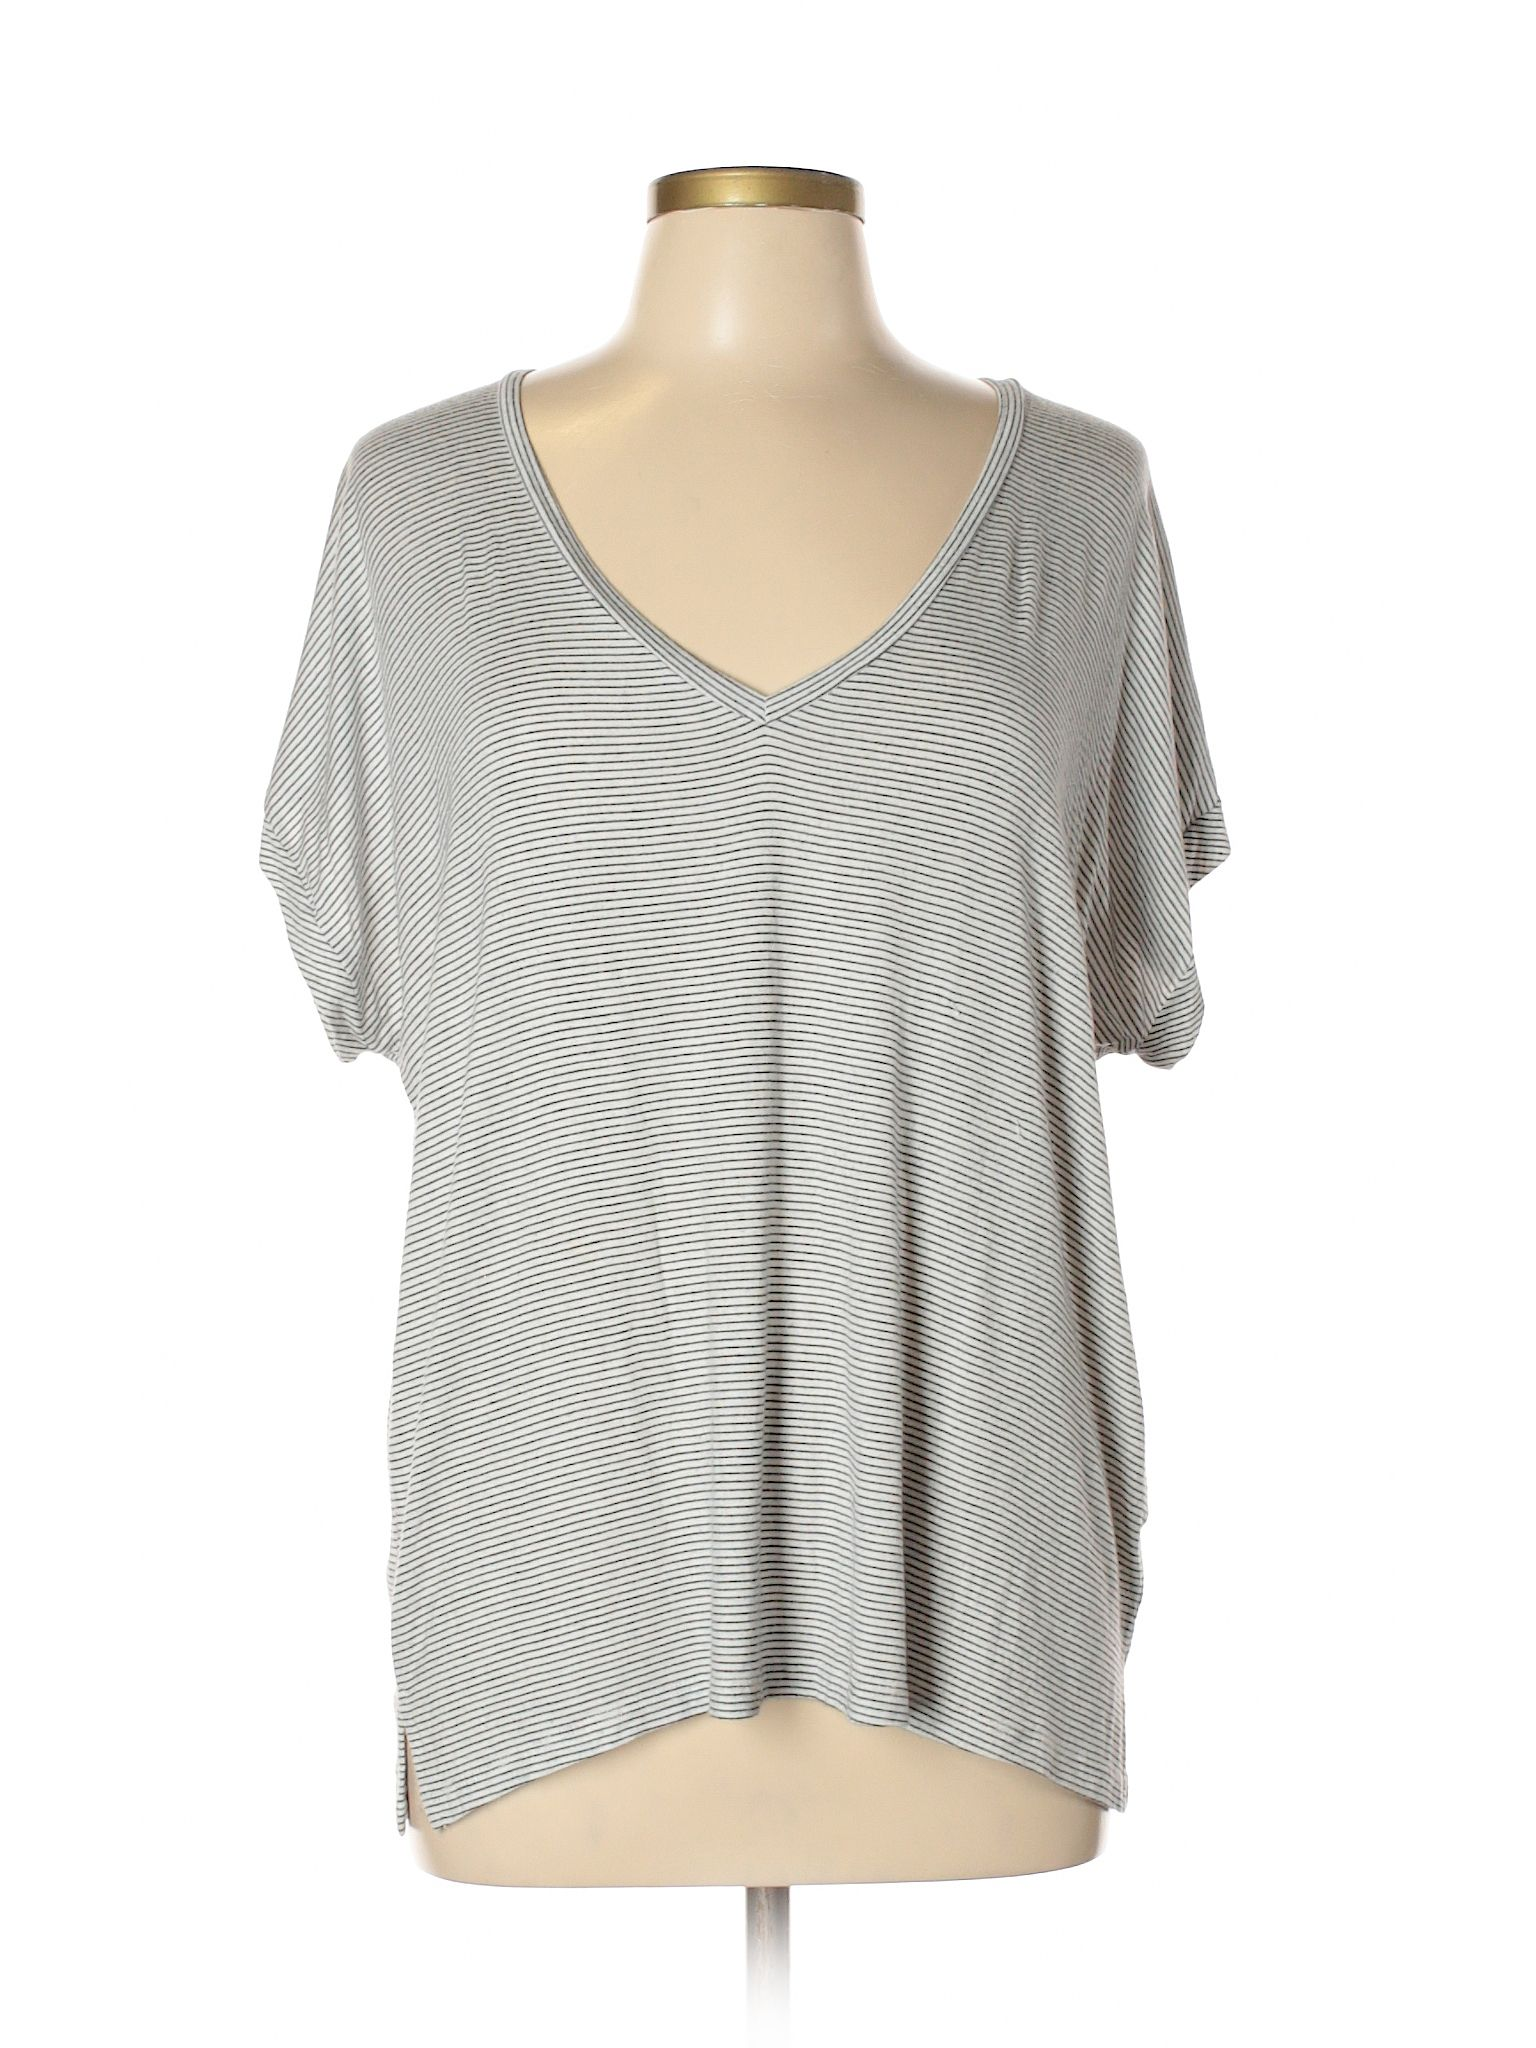 0bd1c099 Short Sleeve T-Shirt | Products | Shirts, Short sleeves, T shirt